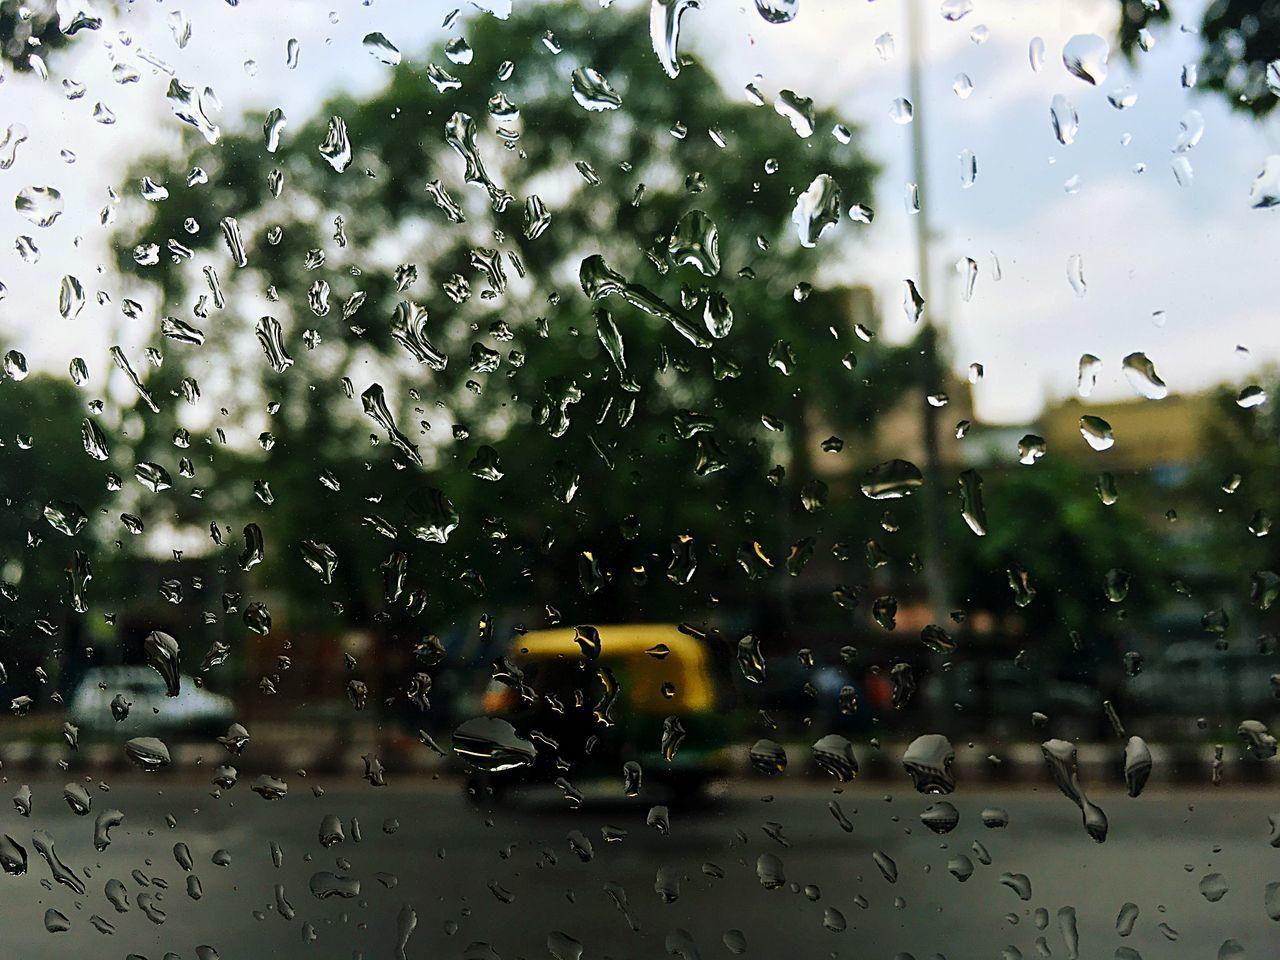 wet, drop, glass - material, rain, mode of transportation, water, window, transparent, land vehicle, transportation, car, motor vehicle, raindrop, no people, rainy season, nature, vehicle interior, day, outdoors, glass